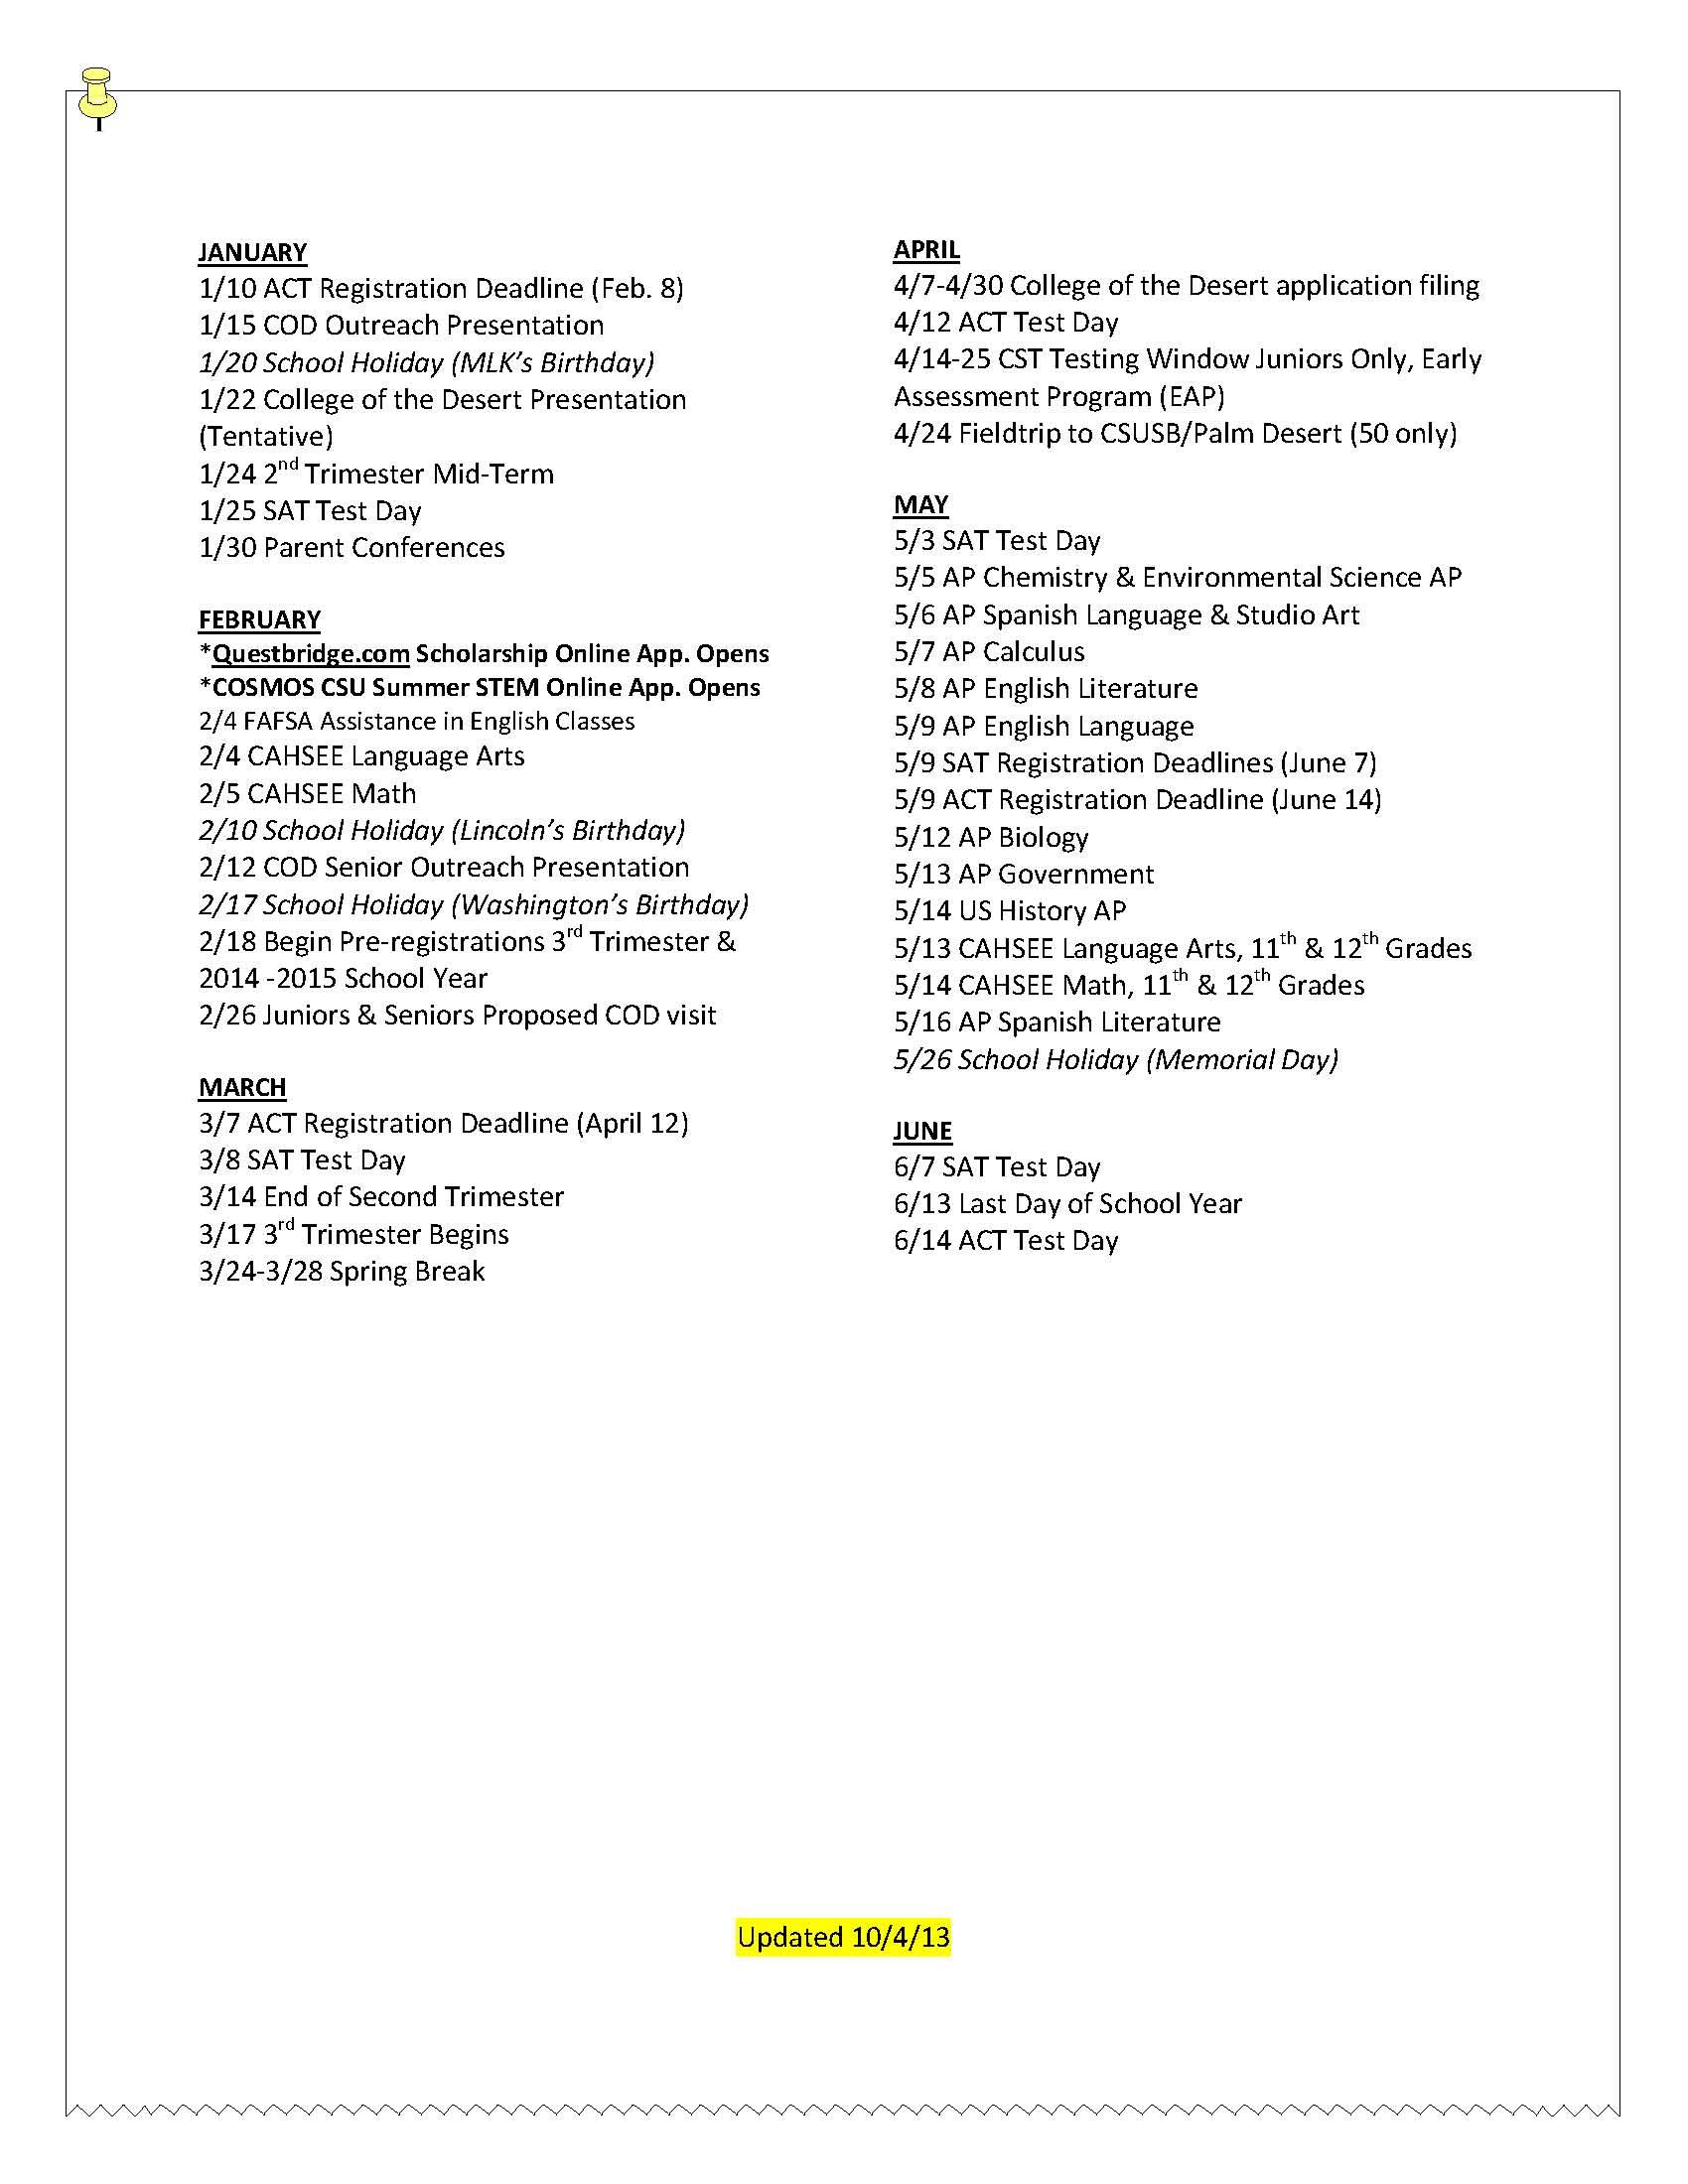 002 Spring Break Essay Junior20calendar2020152012 18 Page 2 Stupendous Plans Alternative Outline Full